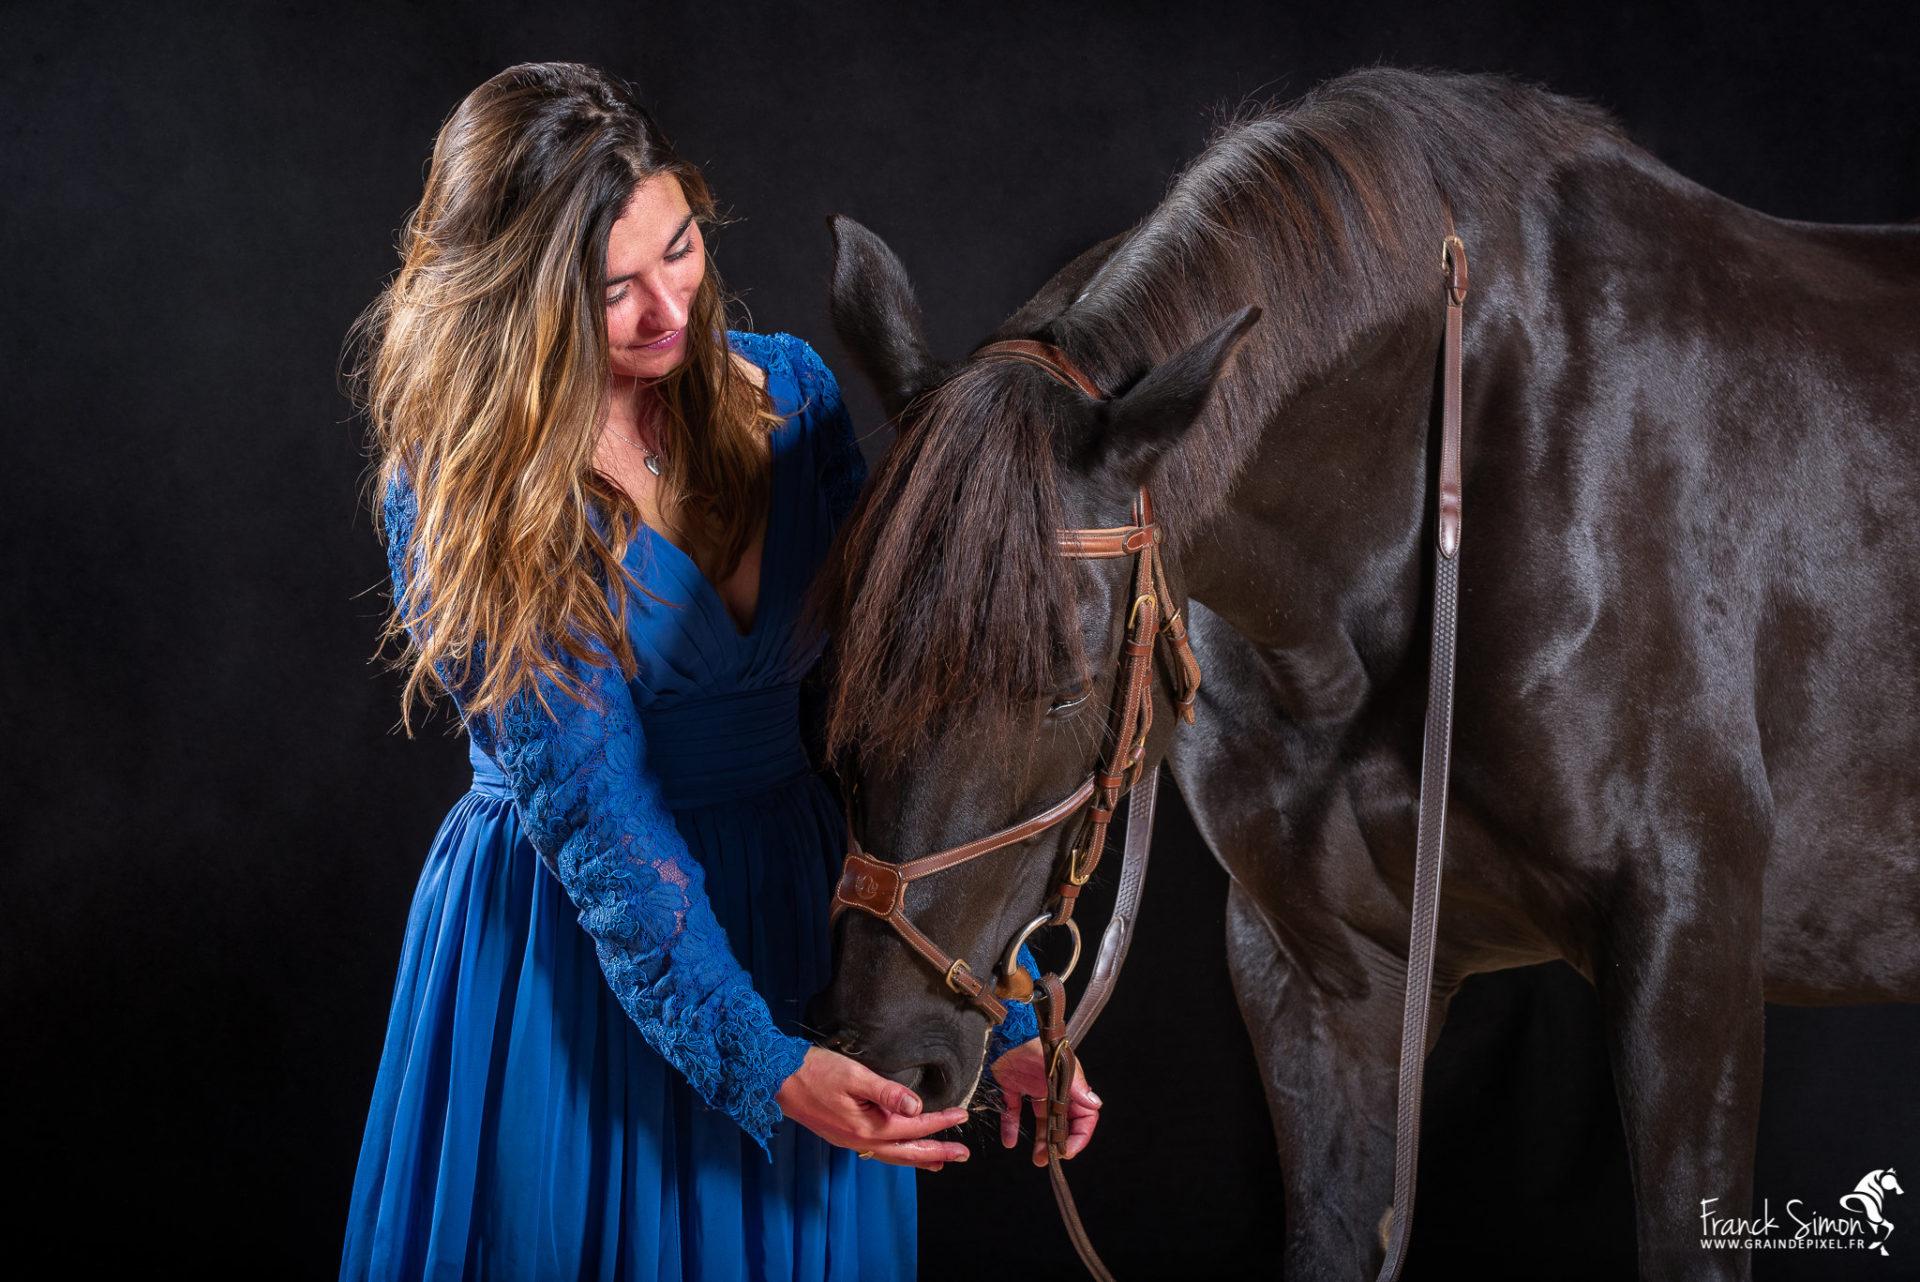 Valentine et ses chevaux